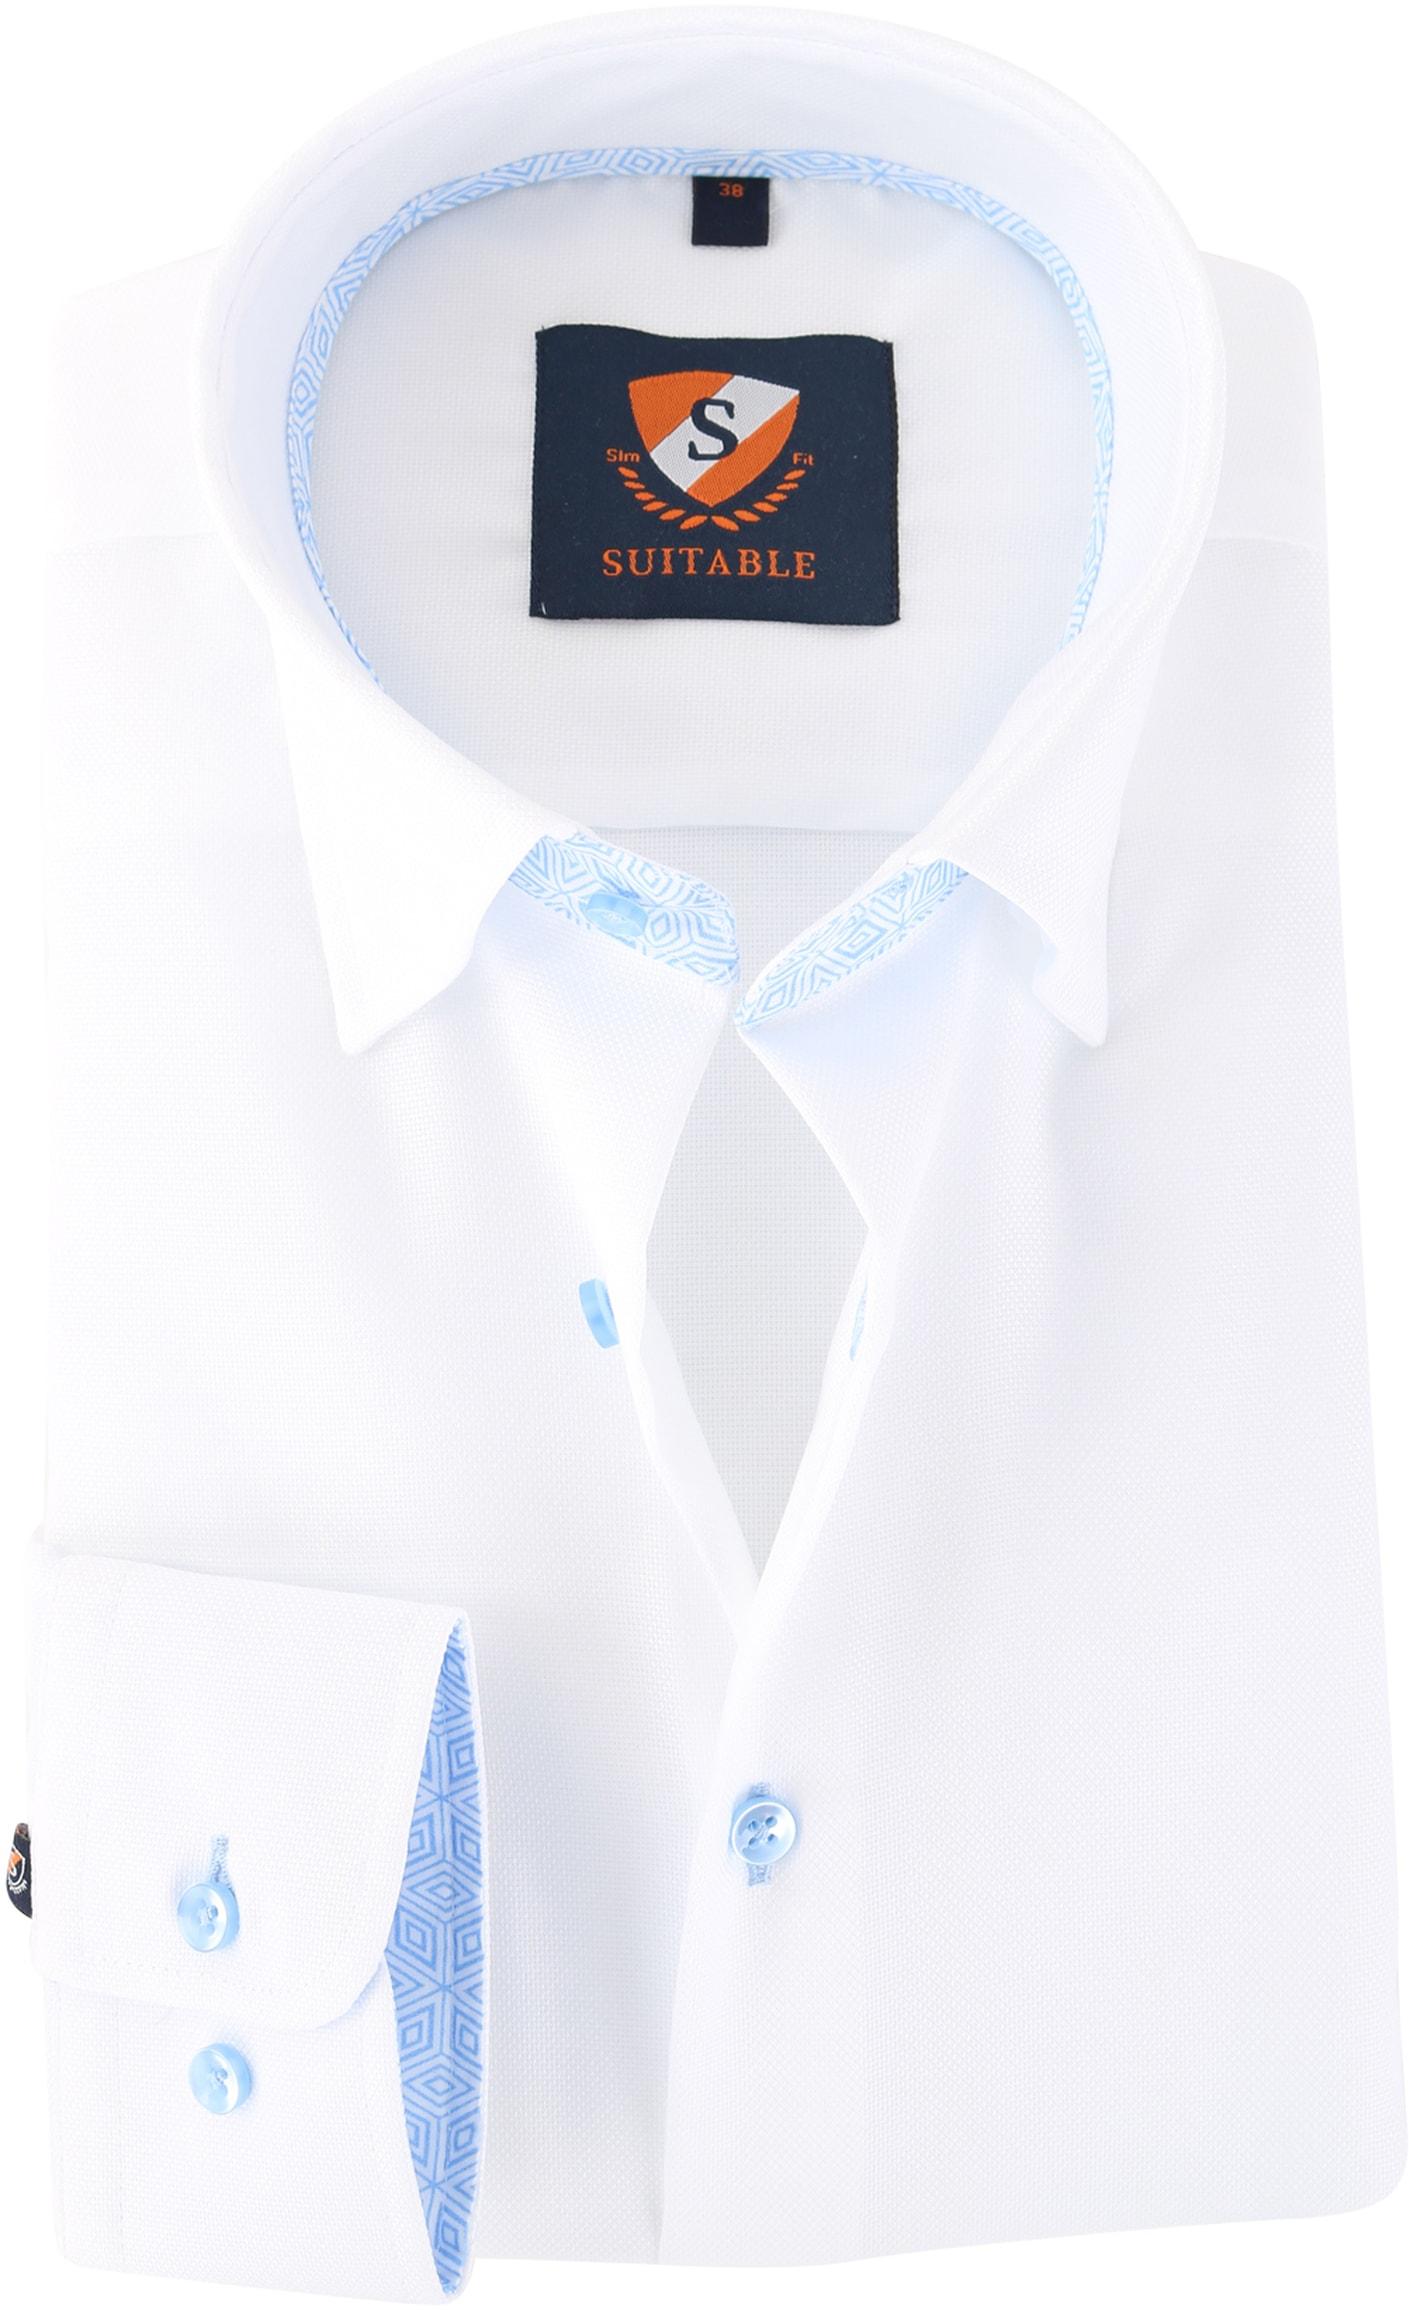 Suitable Overhemd Wit 149-1 foto 0